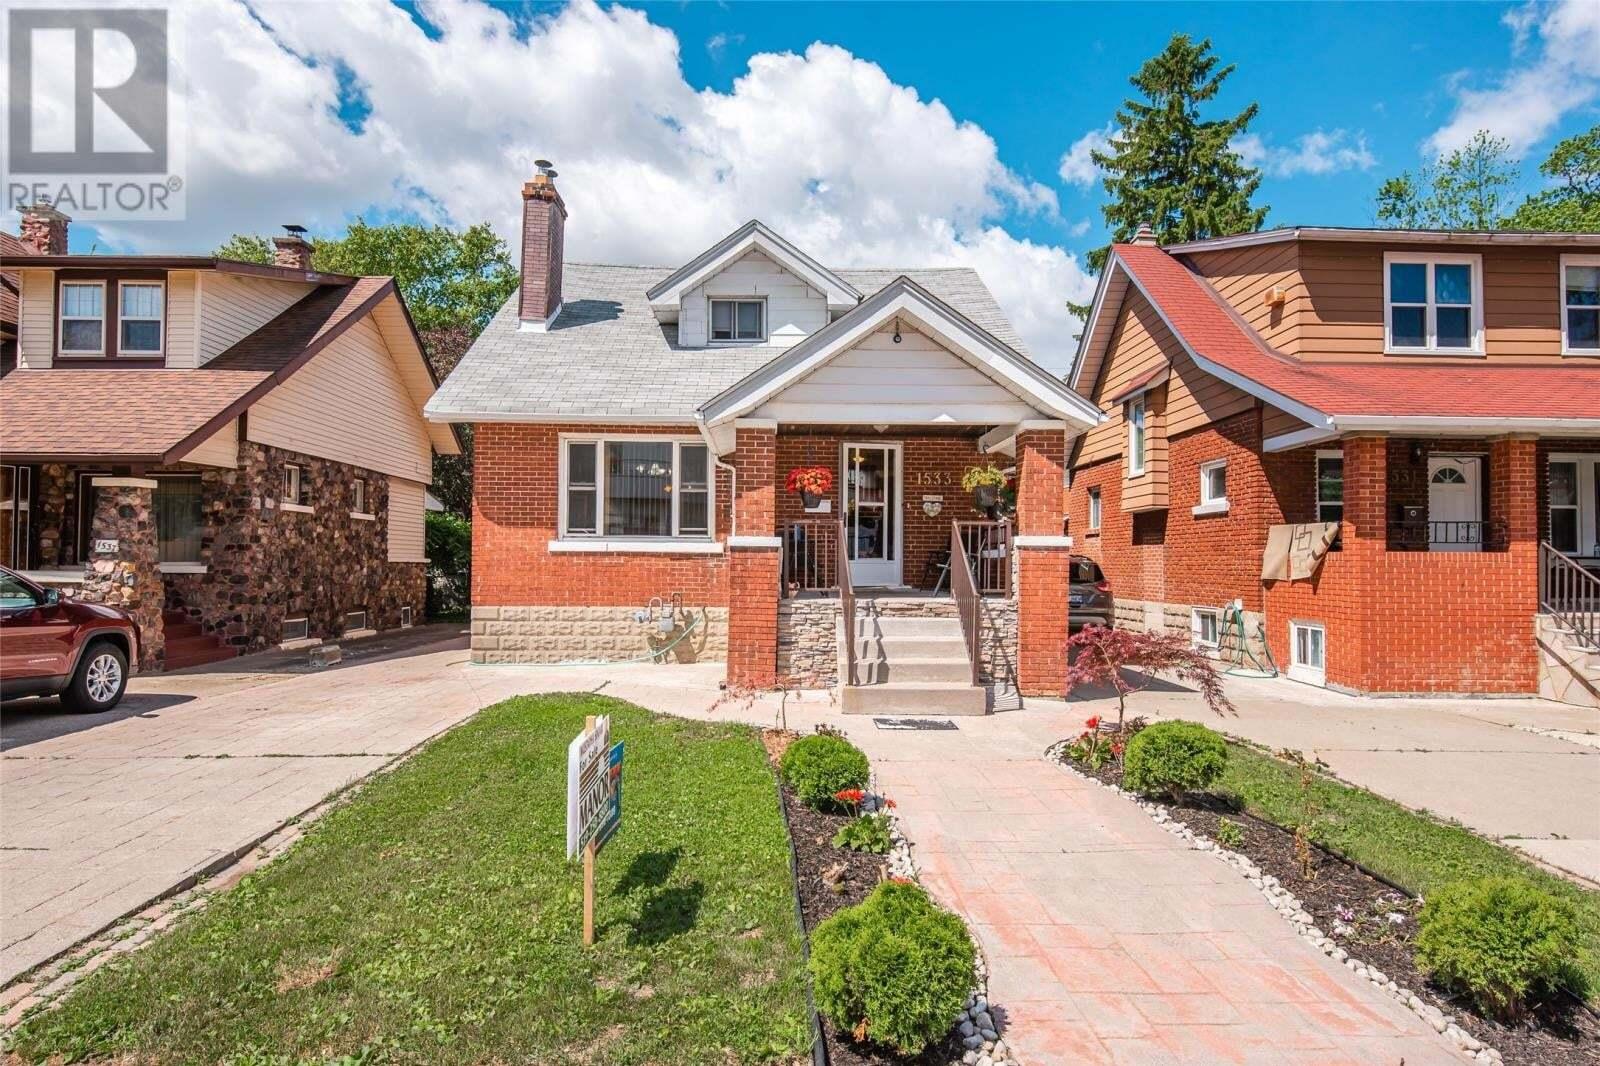 House for sale at 1533 Pelissier St Windsor Ontario - MLS: 20008025